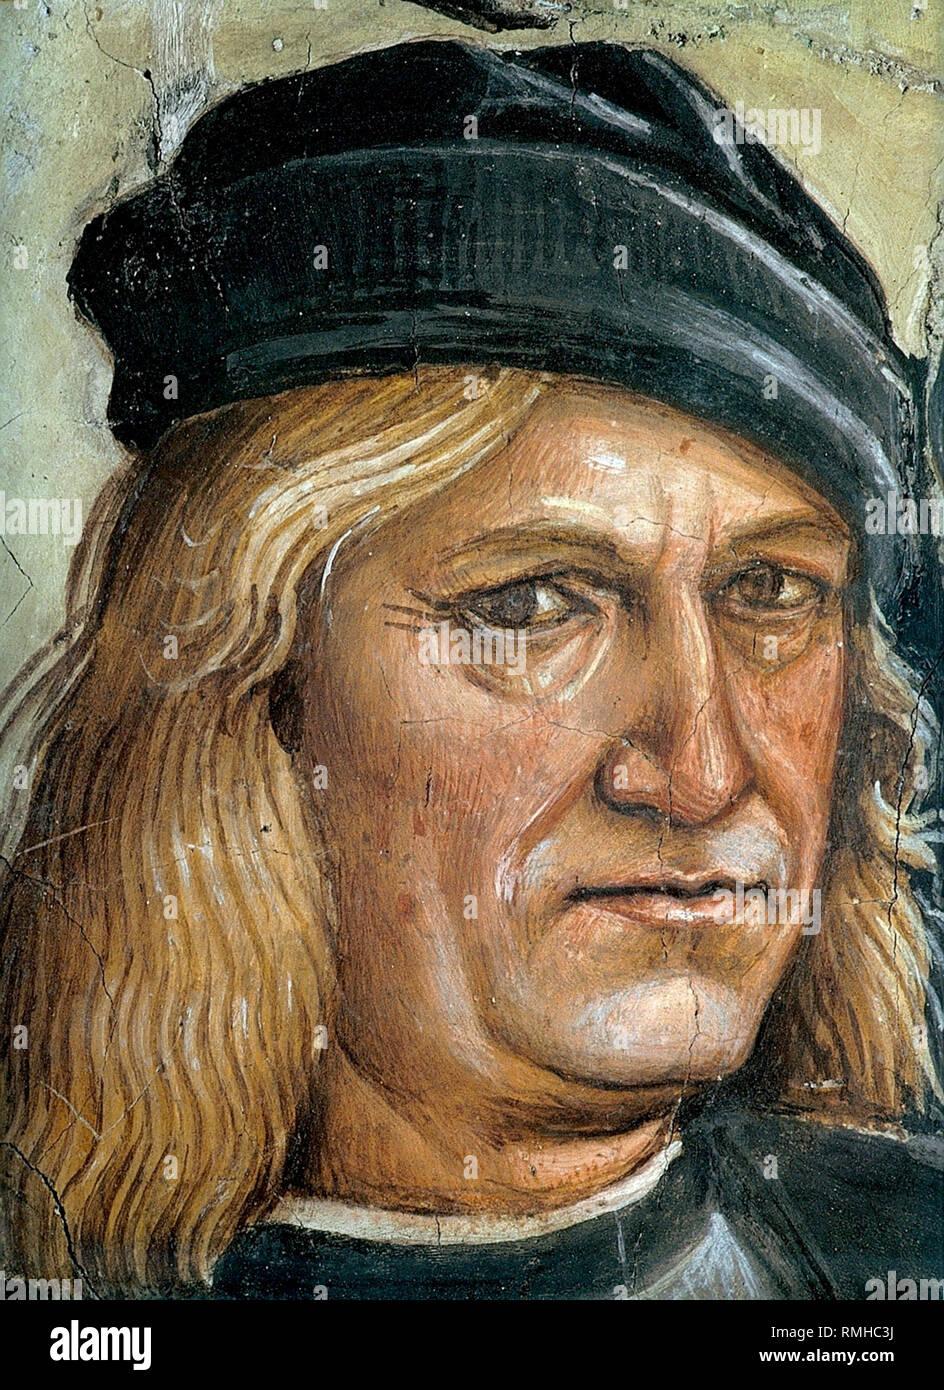 Luca Signorelli (1450 - 1523), pintor renacentista italiano Imagen De Stock